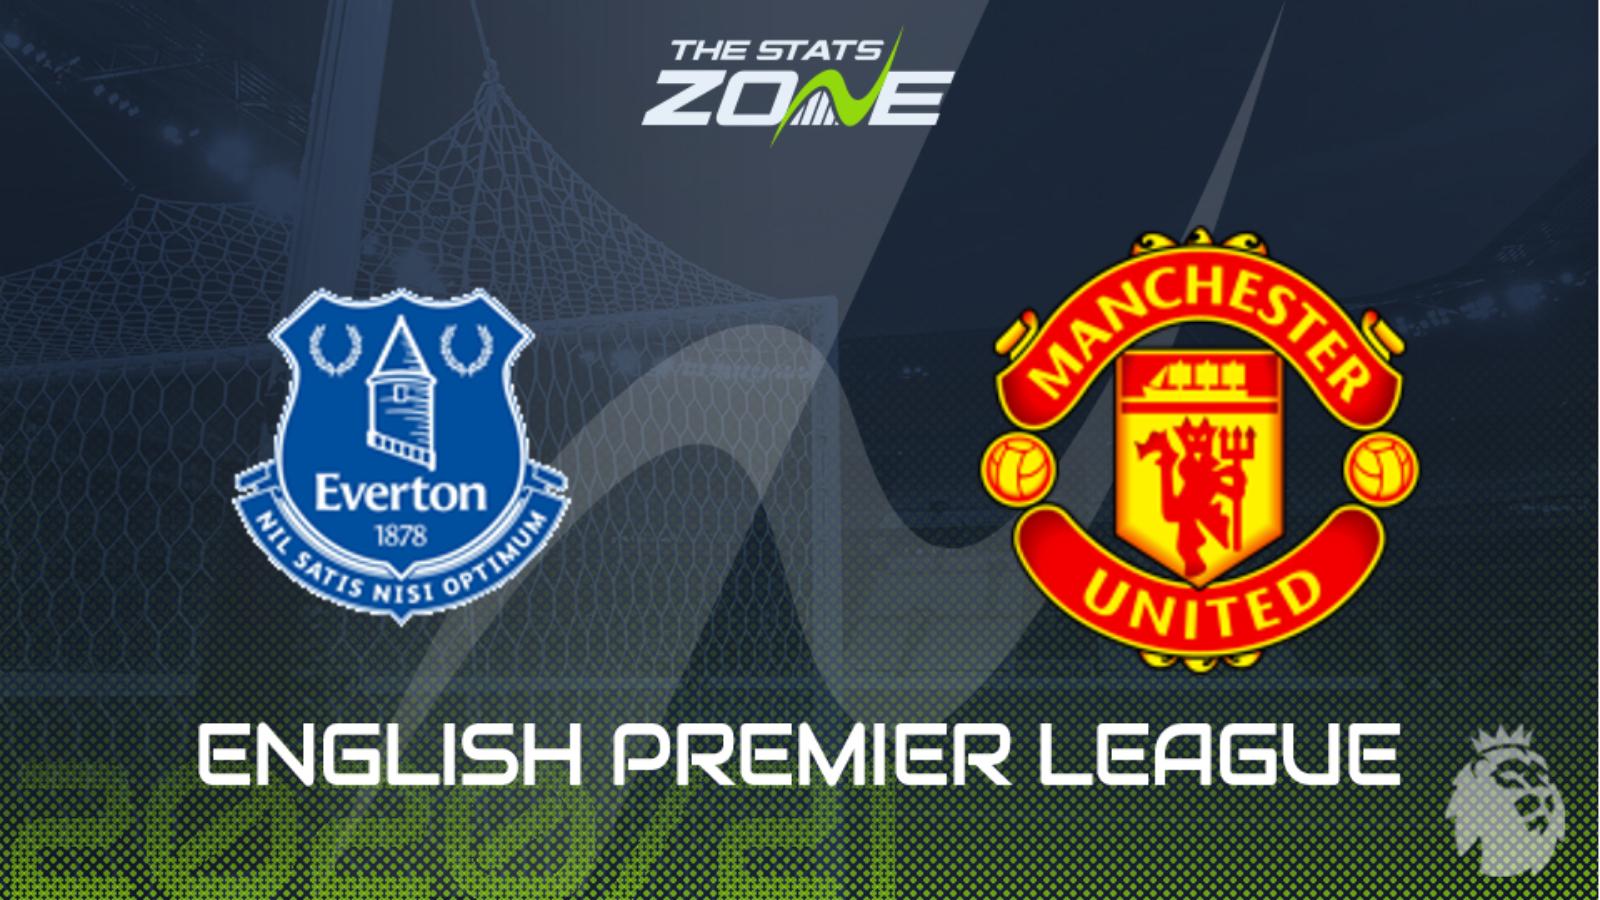 2020 21 Premier League Everton Vs Man Utd Preview Prediction The Stats Zone